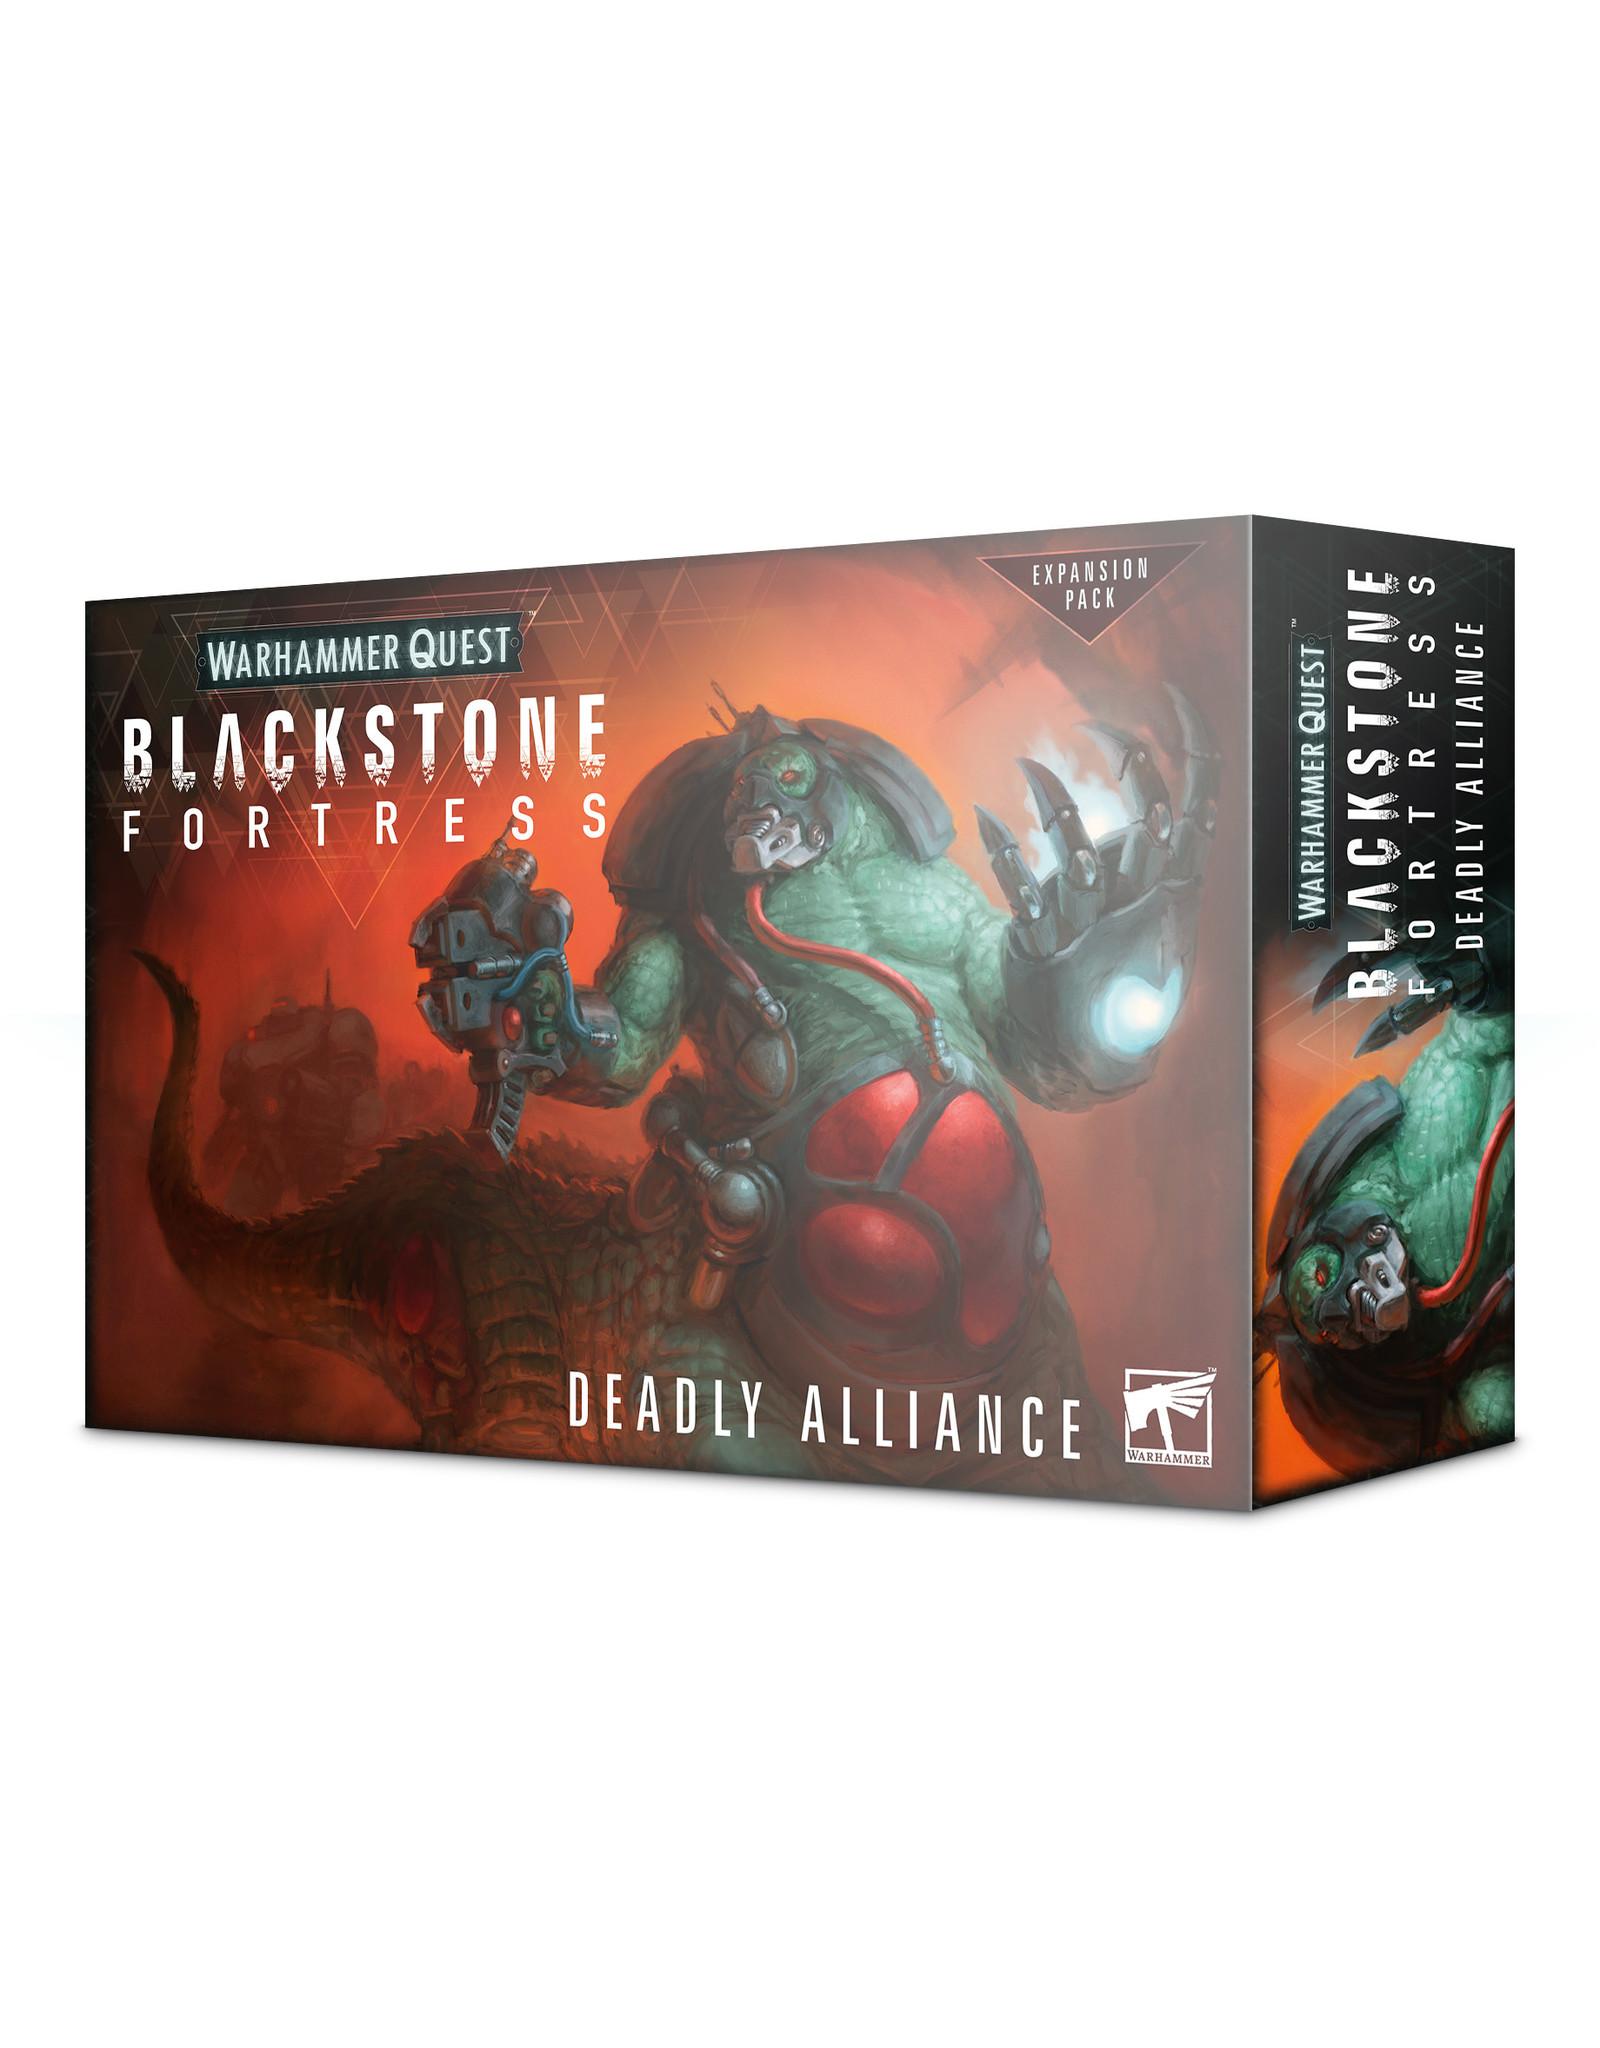 Blackstone Fortress - Deadly Alliance